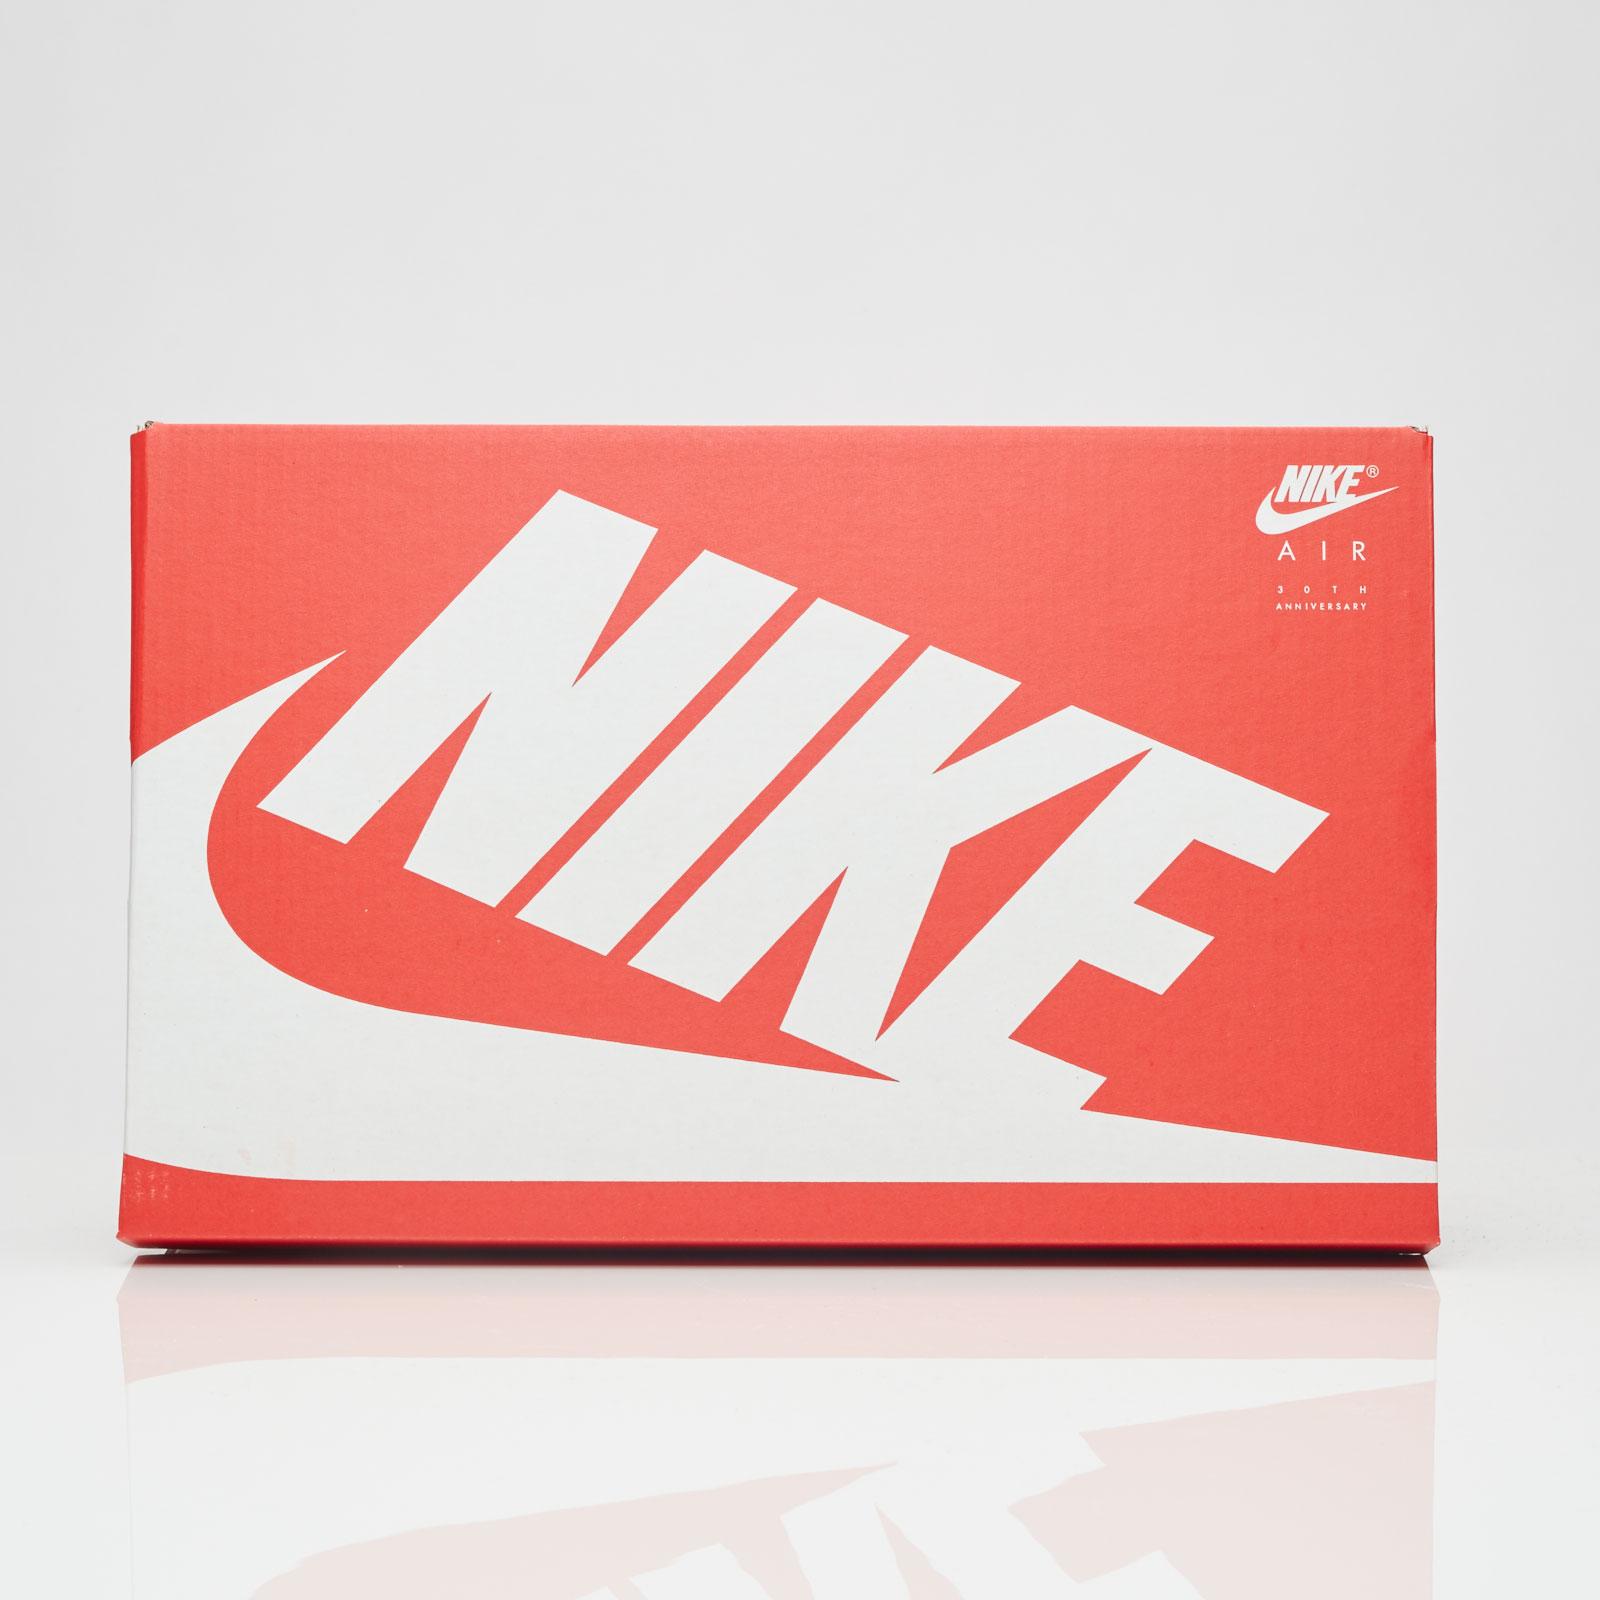 the latest 185e9 ccd5a Nike Sportswear Air Max 1 Ultra 2.0 Le - 8. Close